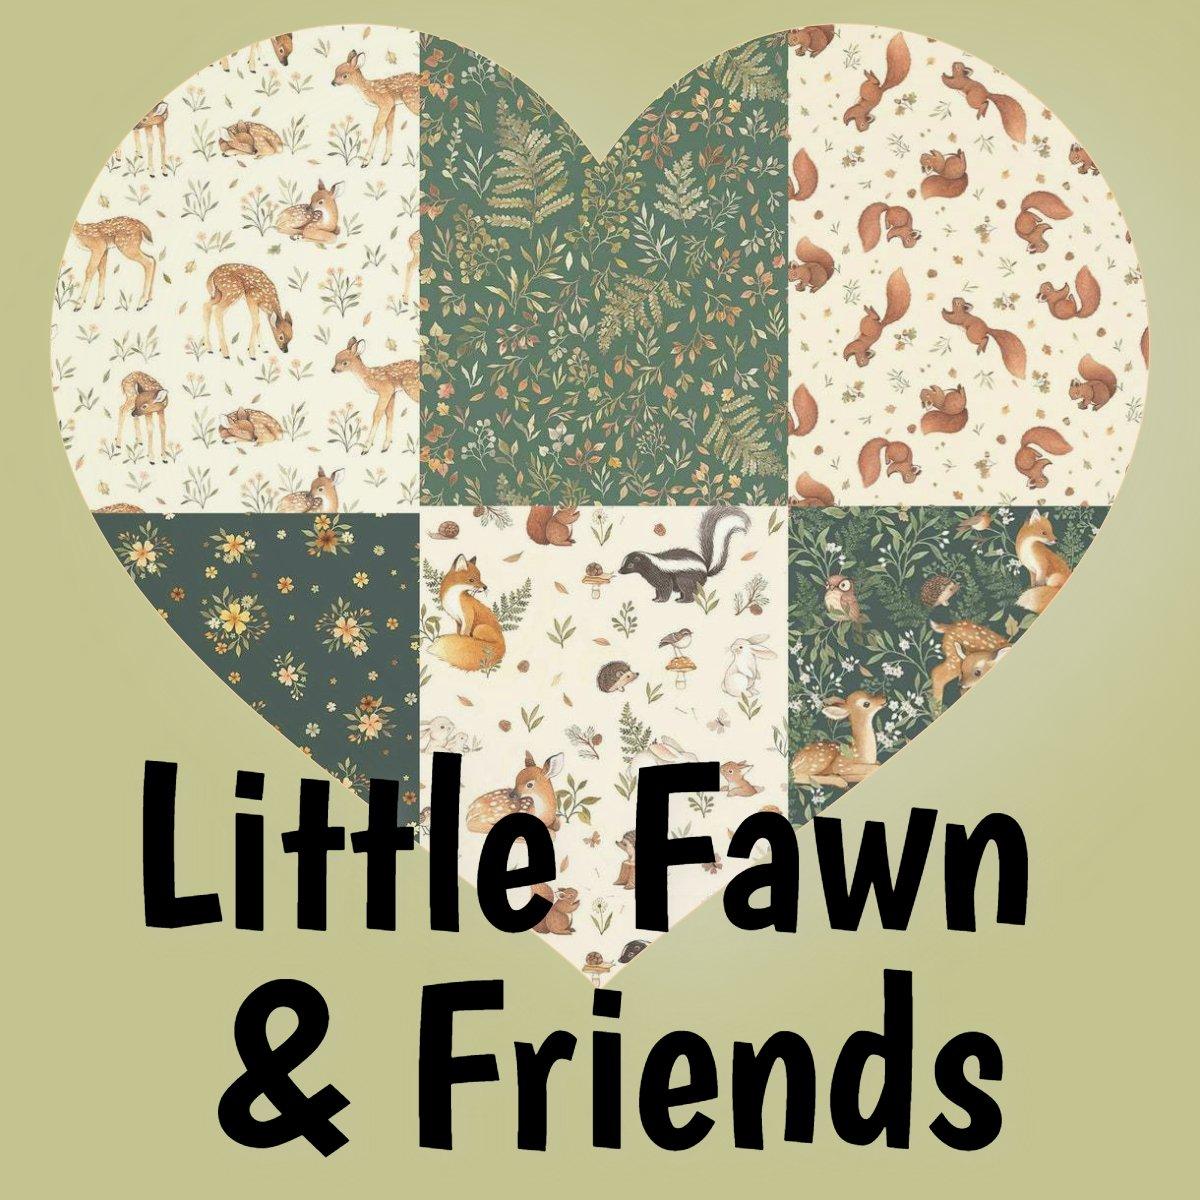 Little Fawn & Friends